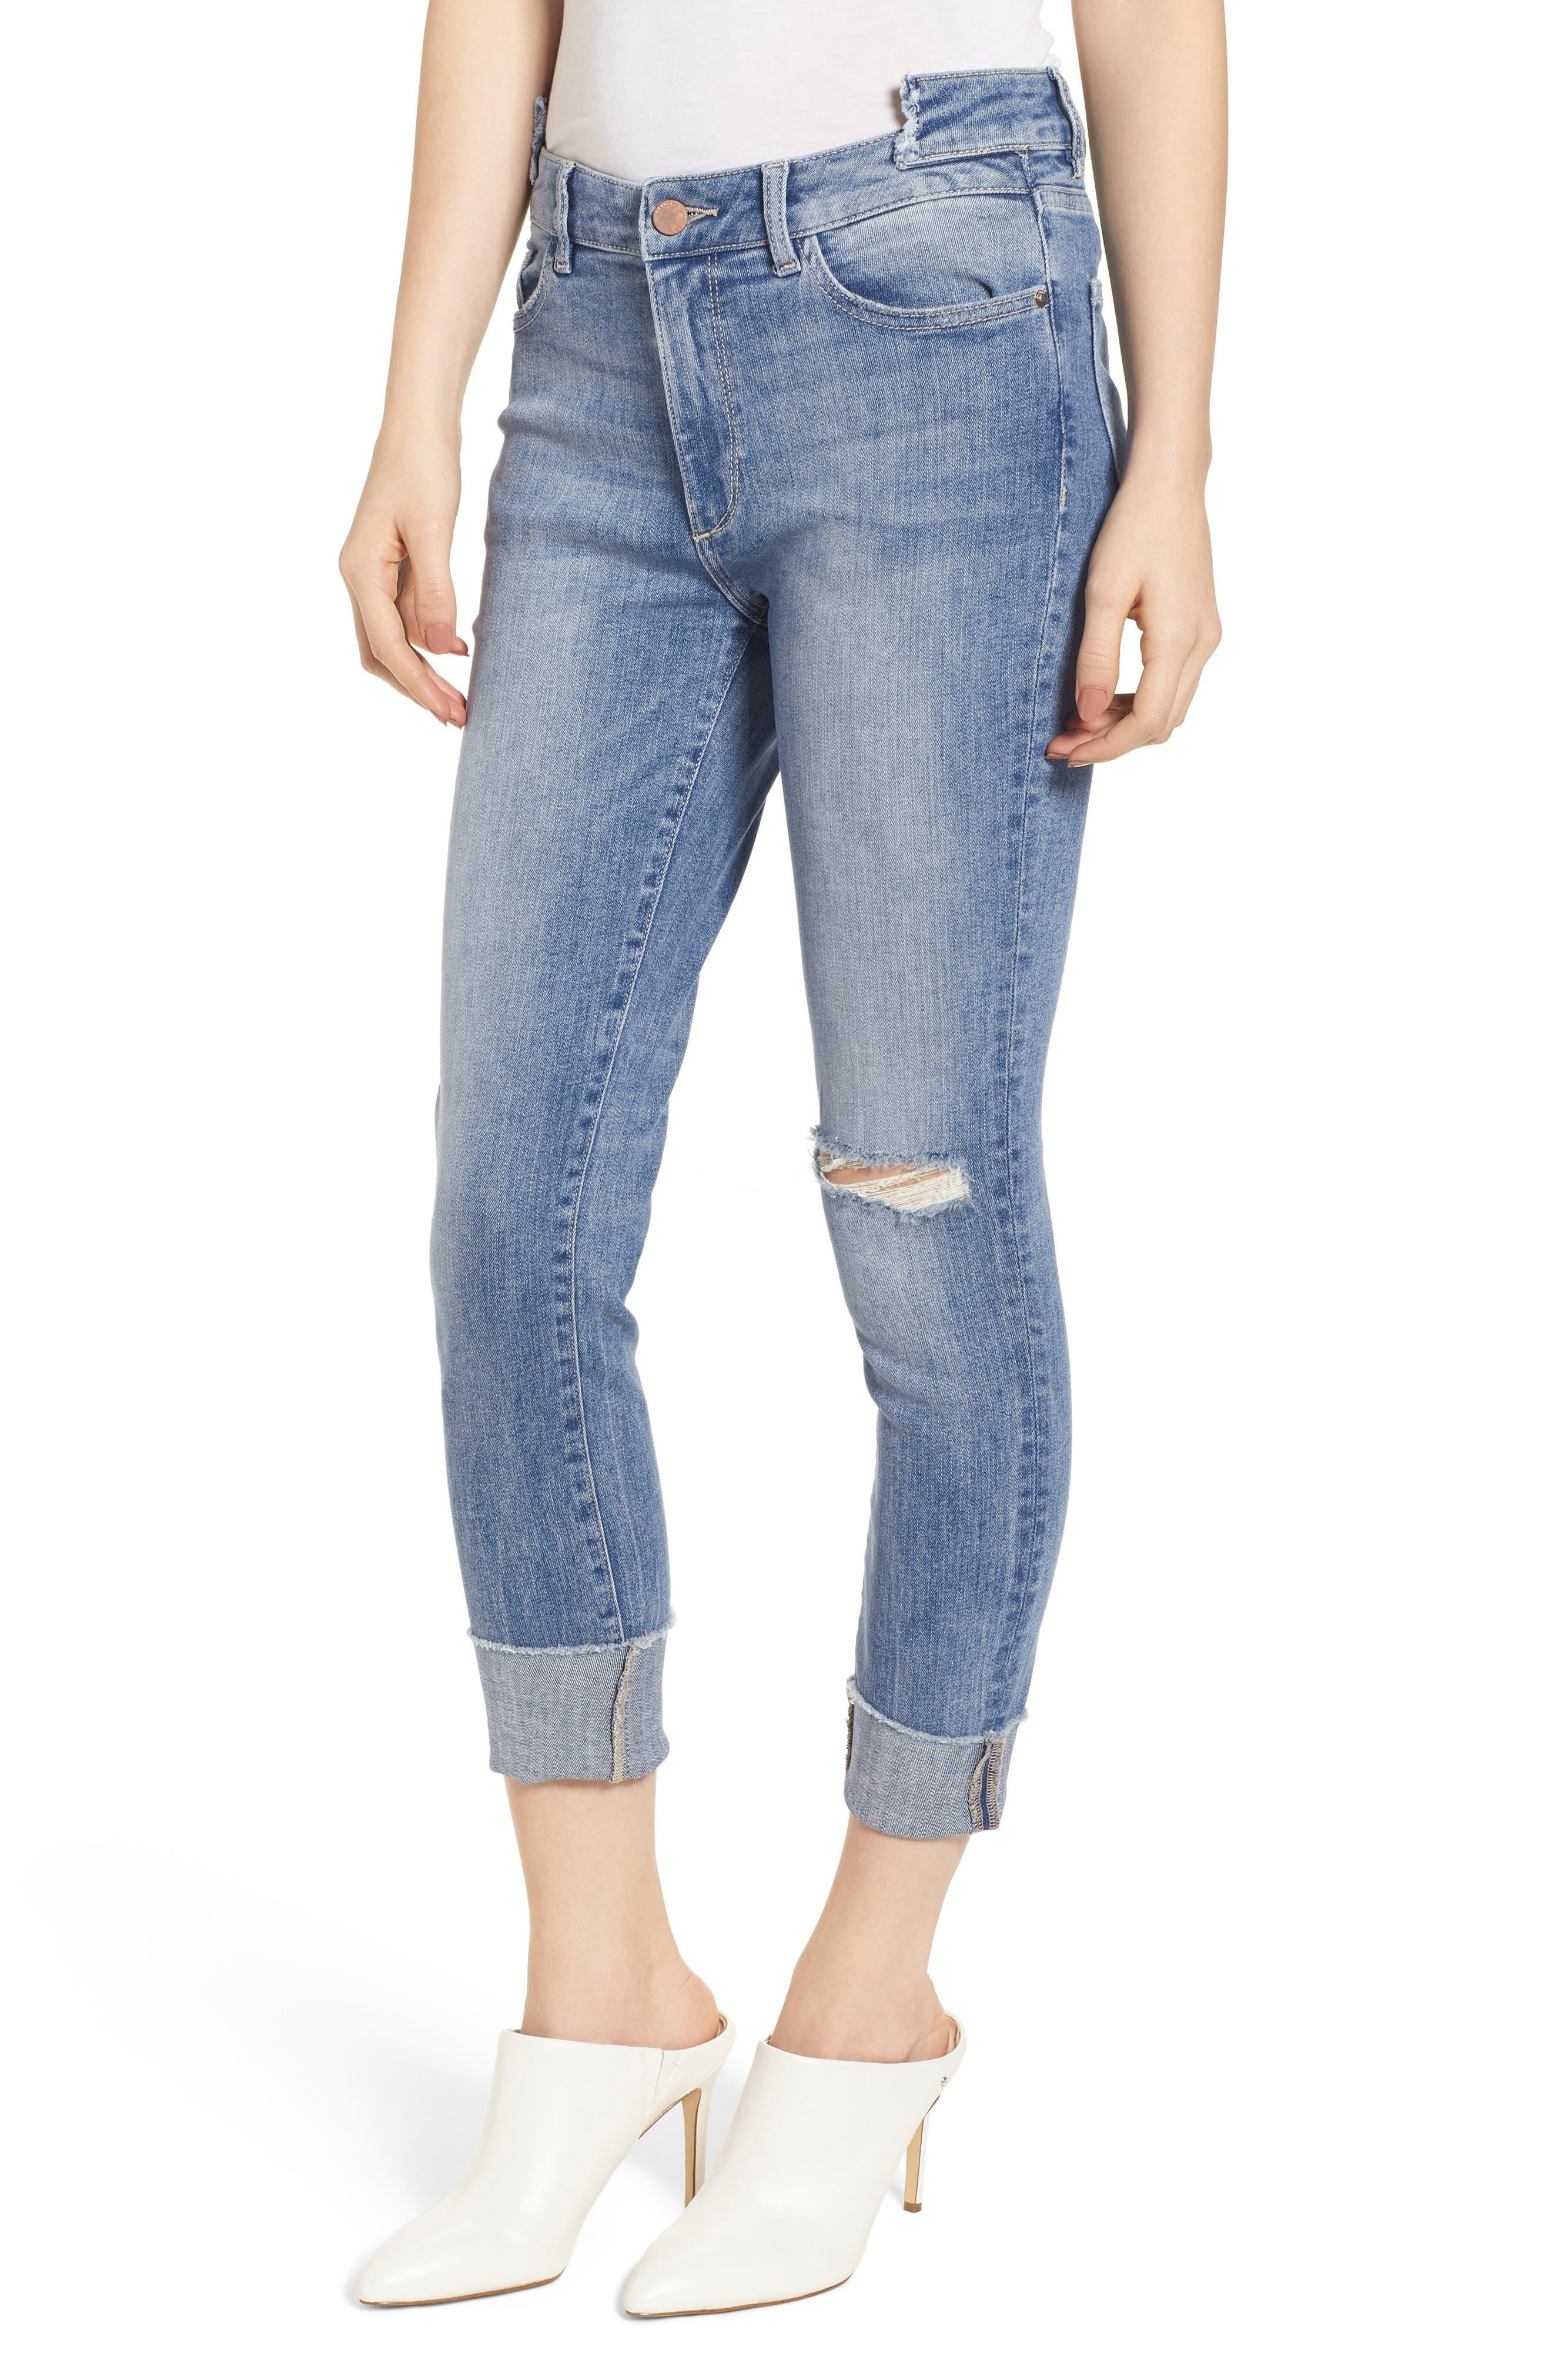 Farrow Instaslim High Waist Ankle Skinny Jeans,                             Main thumbnail 1, color,                             429